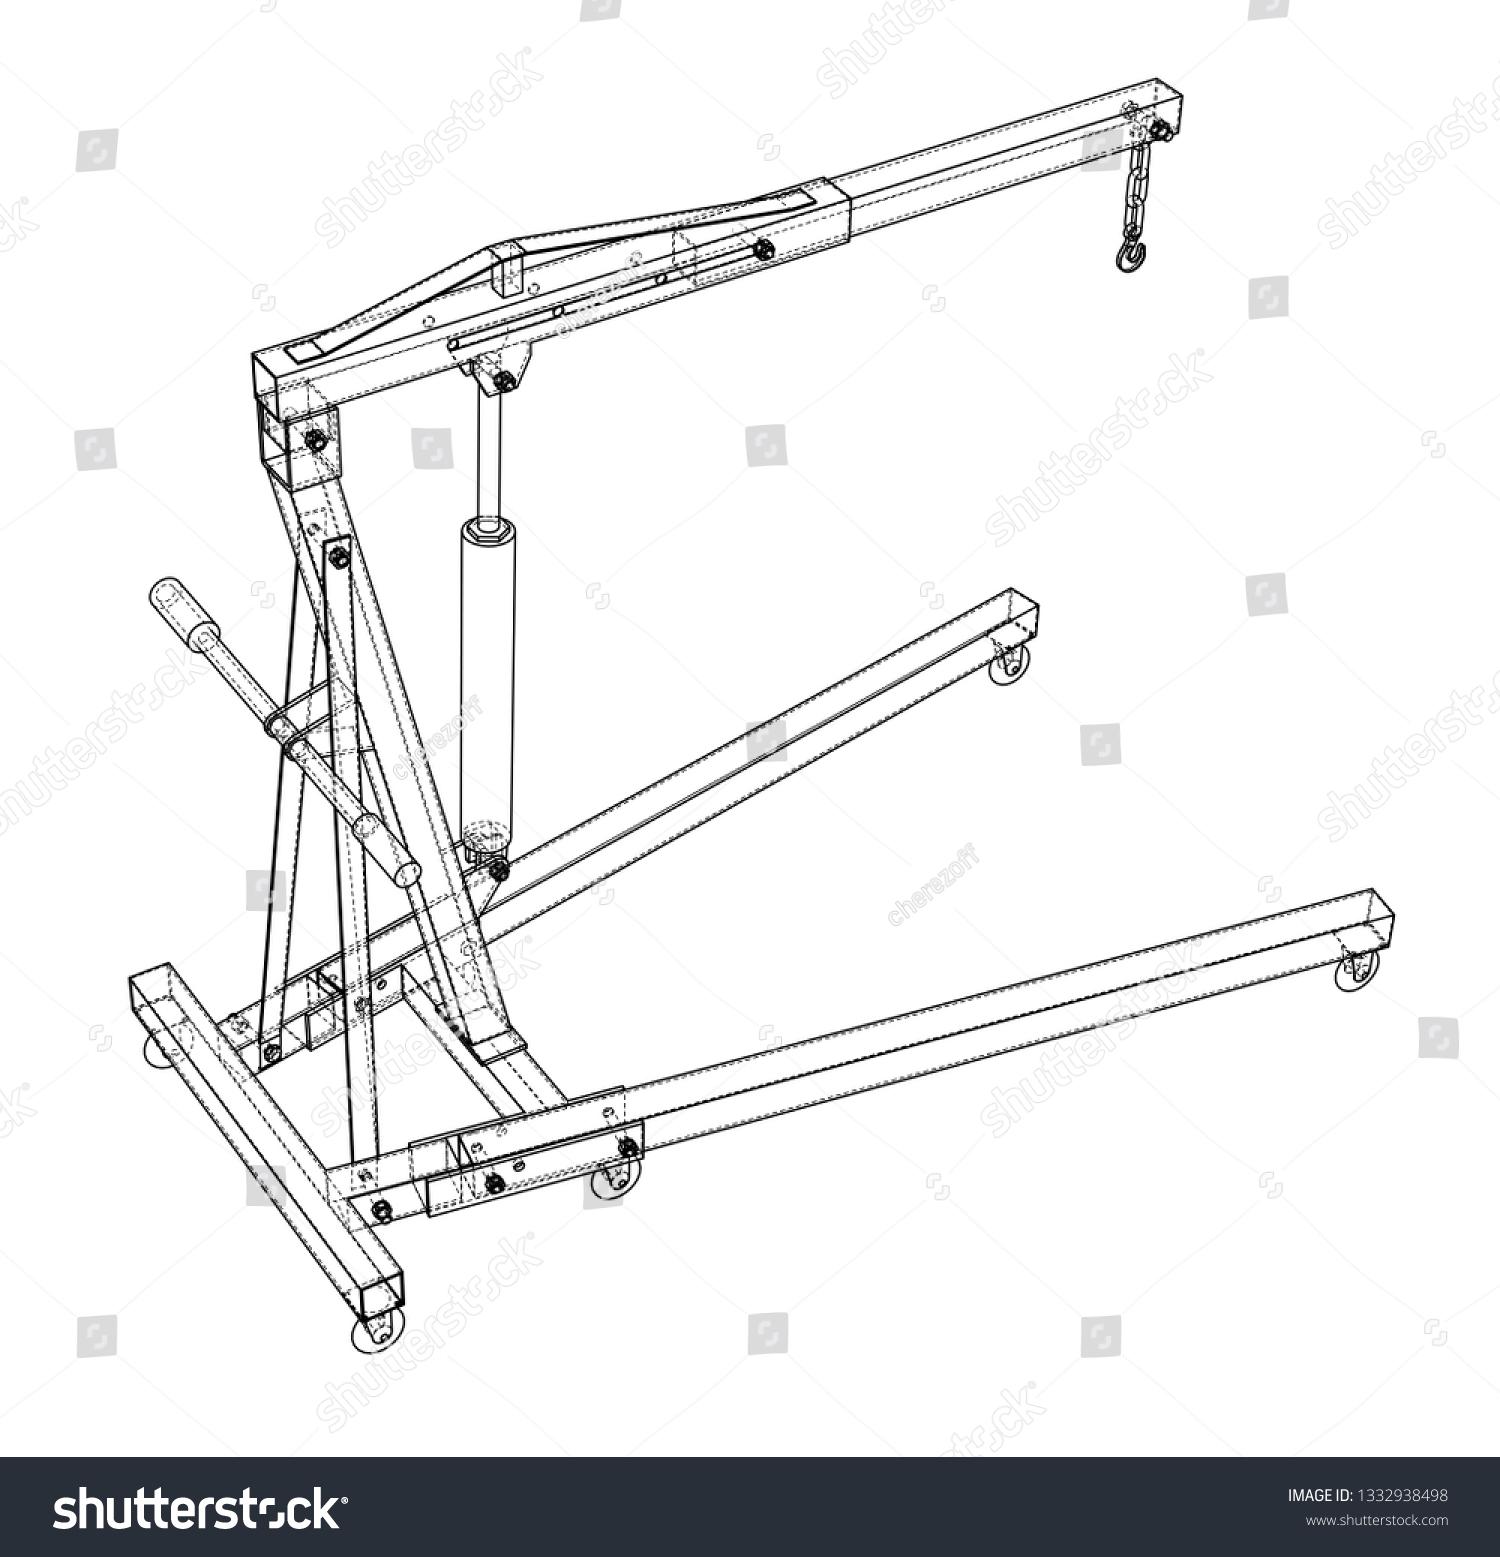 hight resolution of engine hoist diagram wiring diagram tutorial flygt pump wiring diagram engine hoist diagram